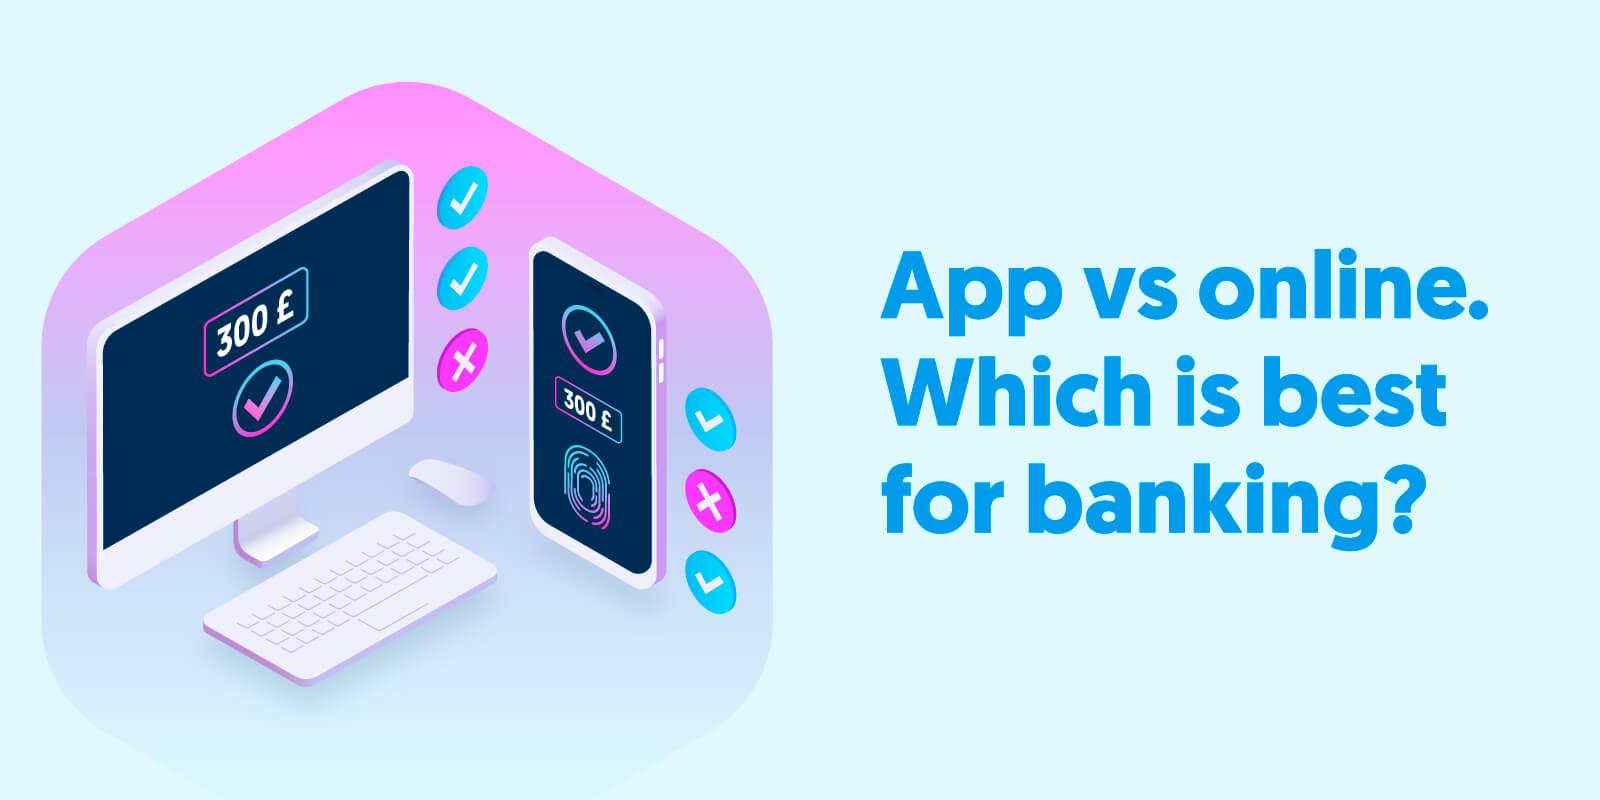 App vs online